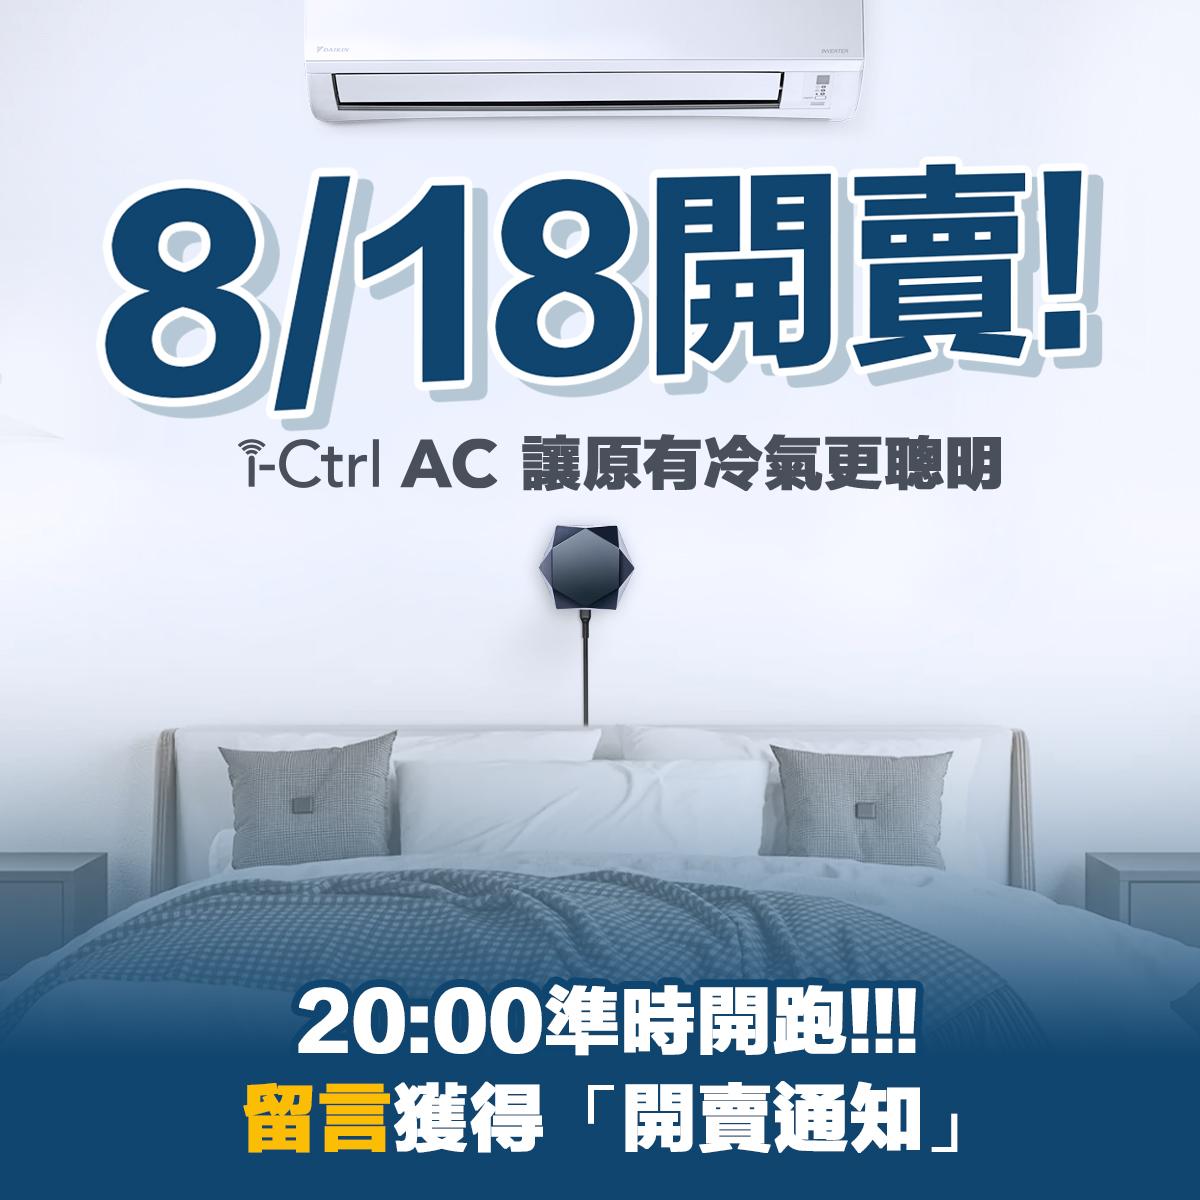 AIFA i-Ctrl AC開賣蓋大樓貼文v1